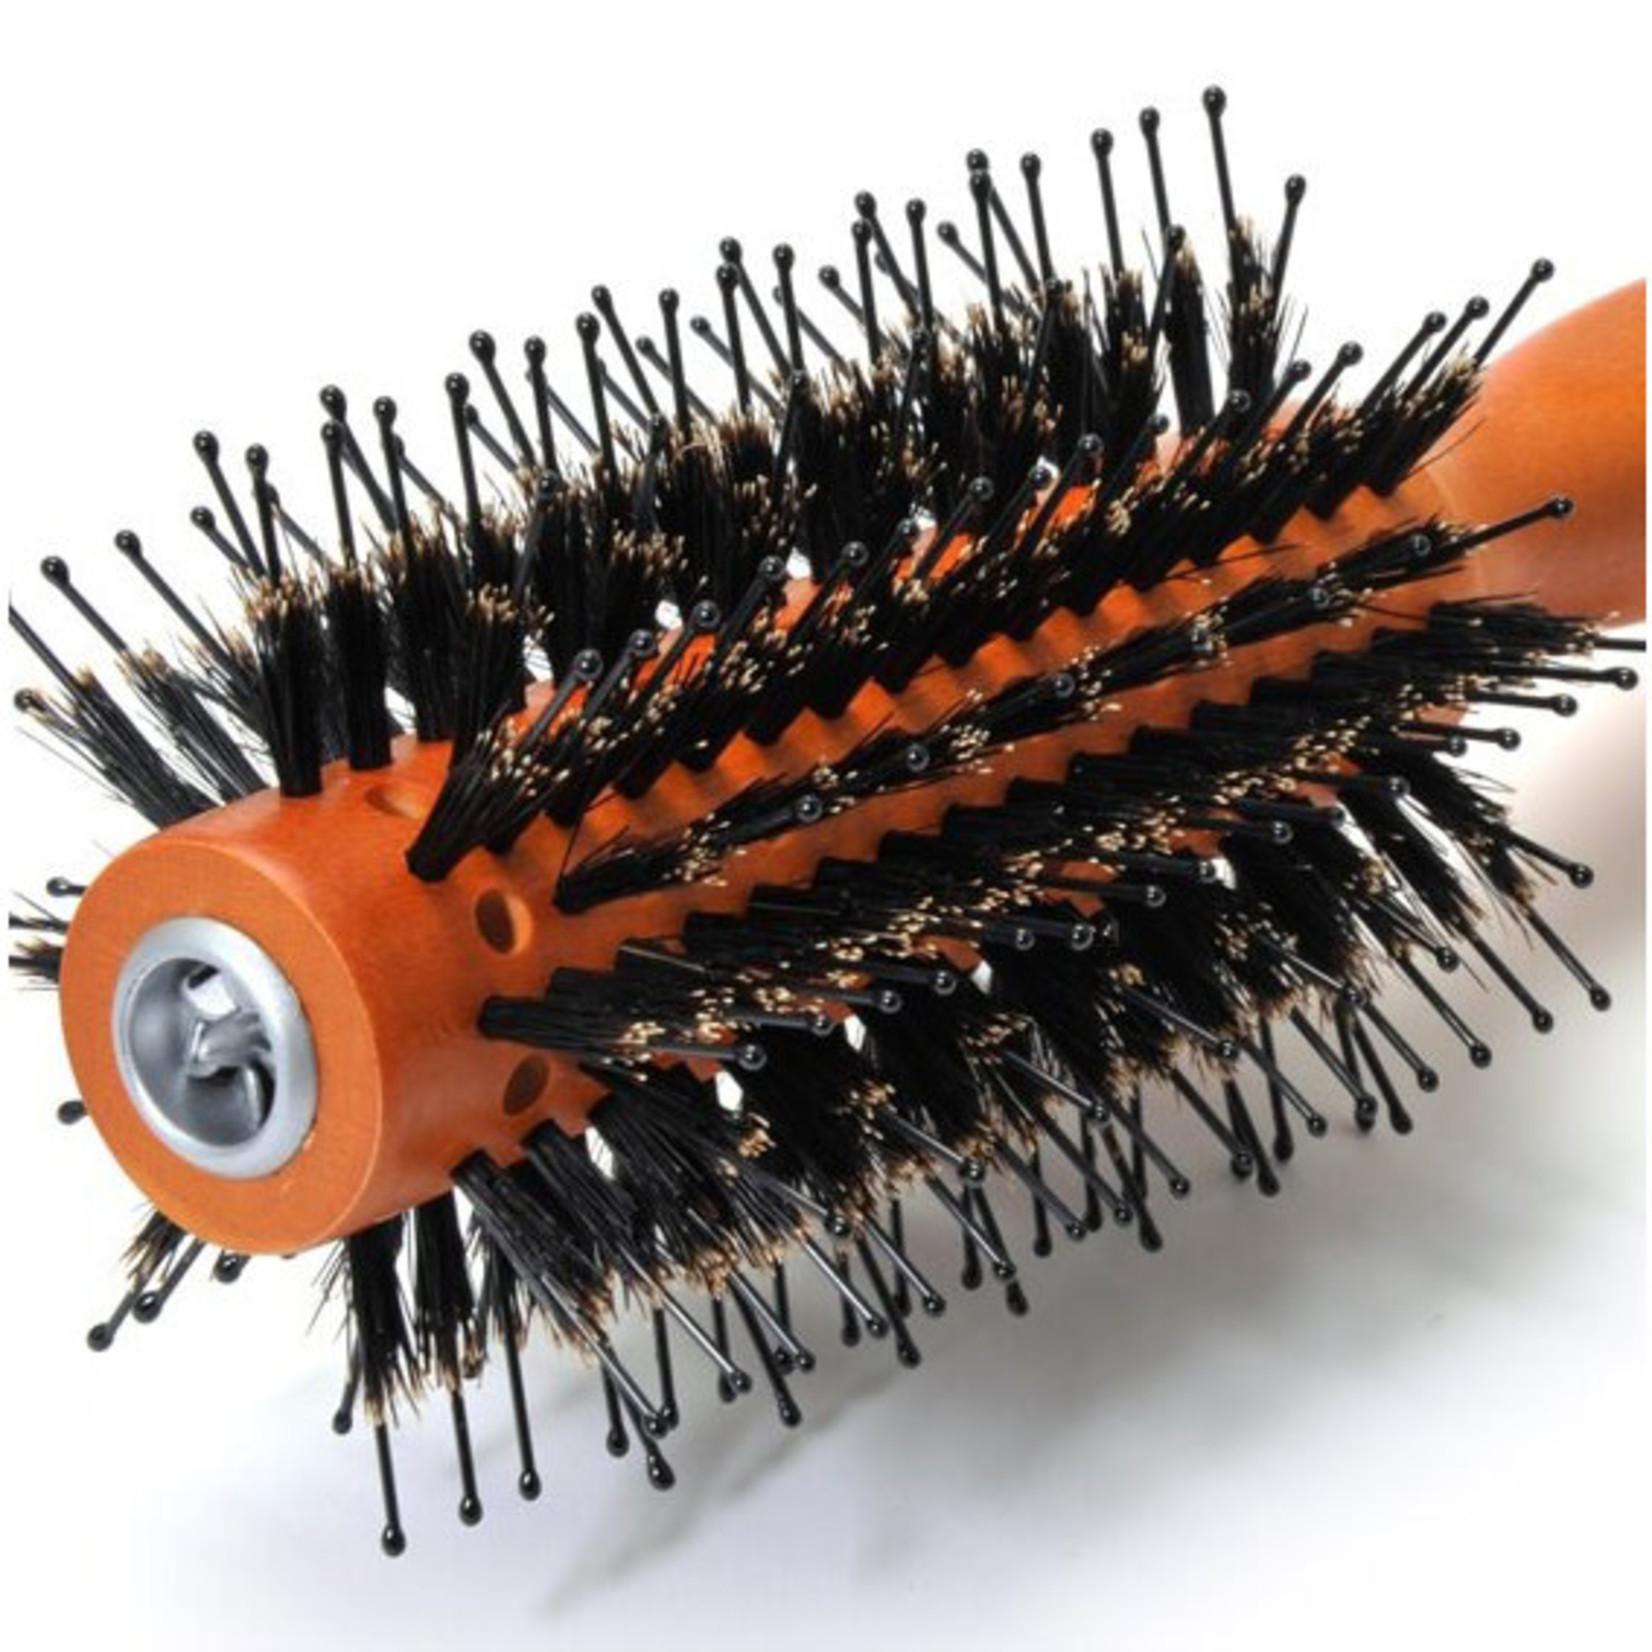 Chantilly Chantilly Mapepe Natural Hair Mix Roll Brush - Large